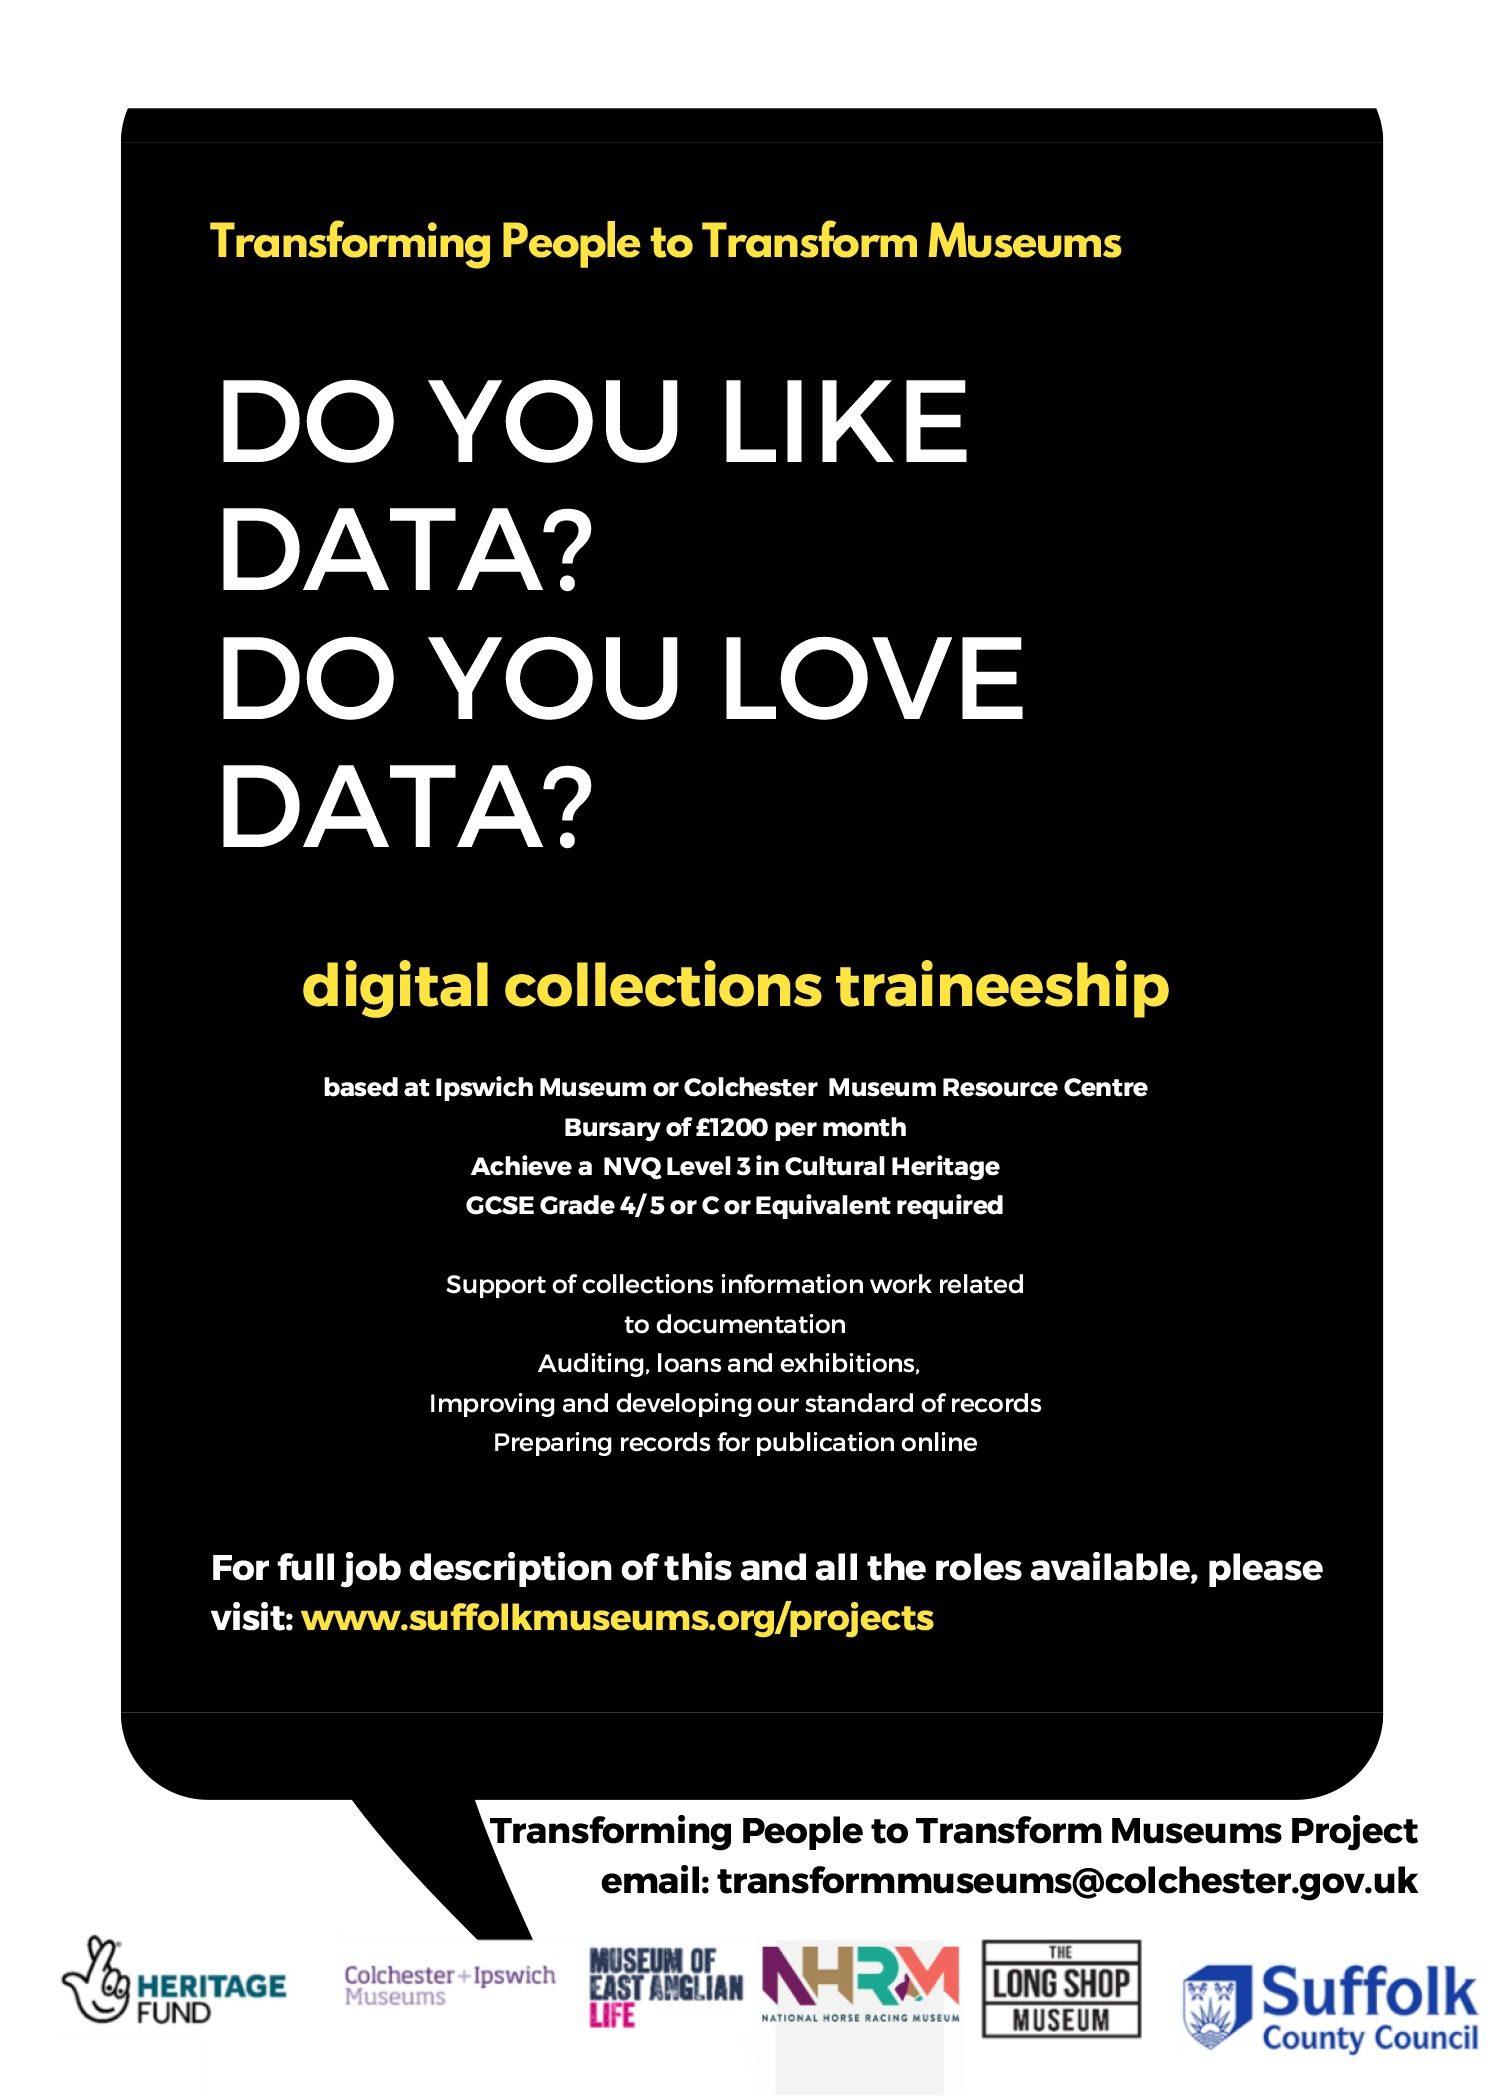 Digital Collections Traineeship